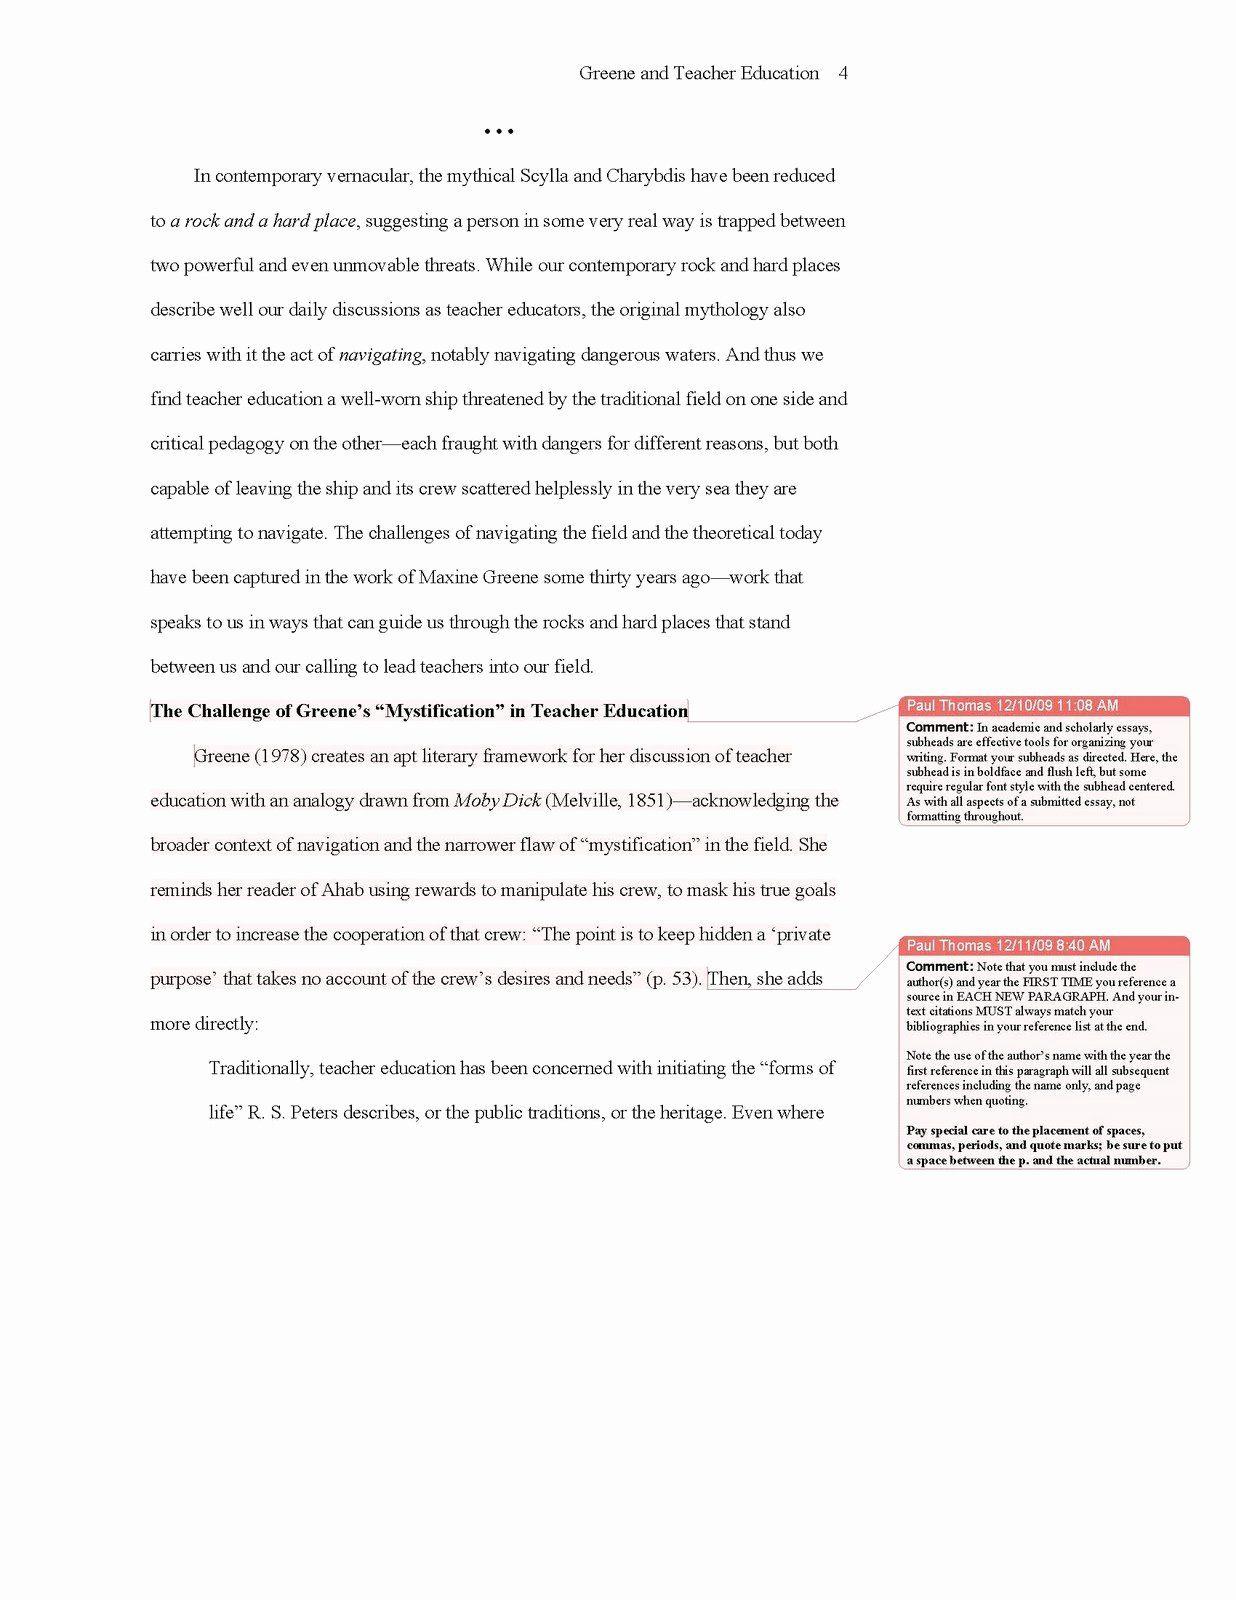 College Essay Format Apa Awesome 49 Apa Essay Format Sample Best S Interview Apa Essay Format Essay College Essay